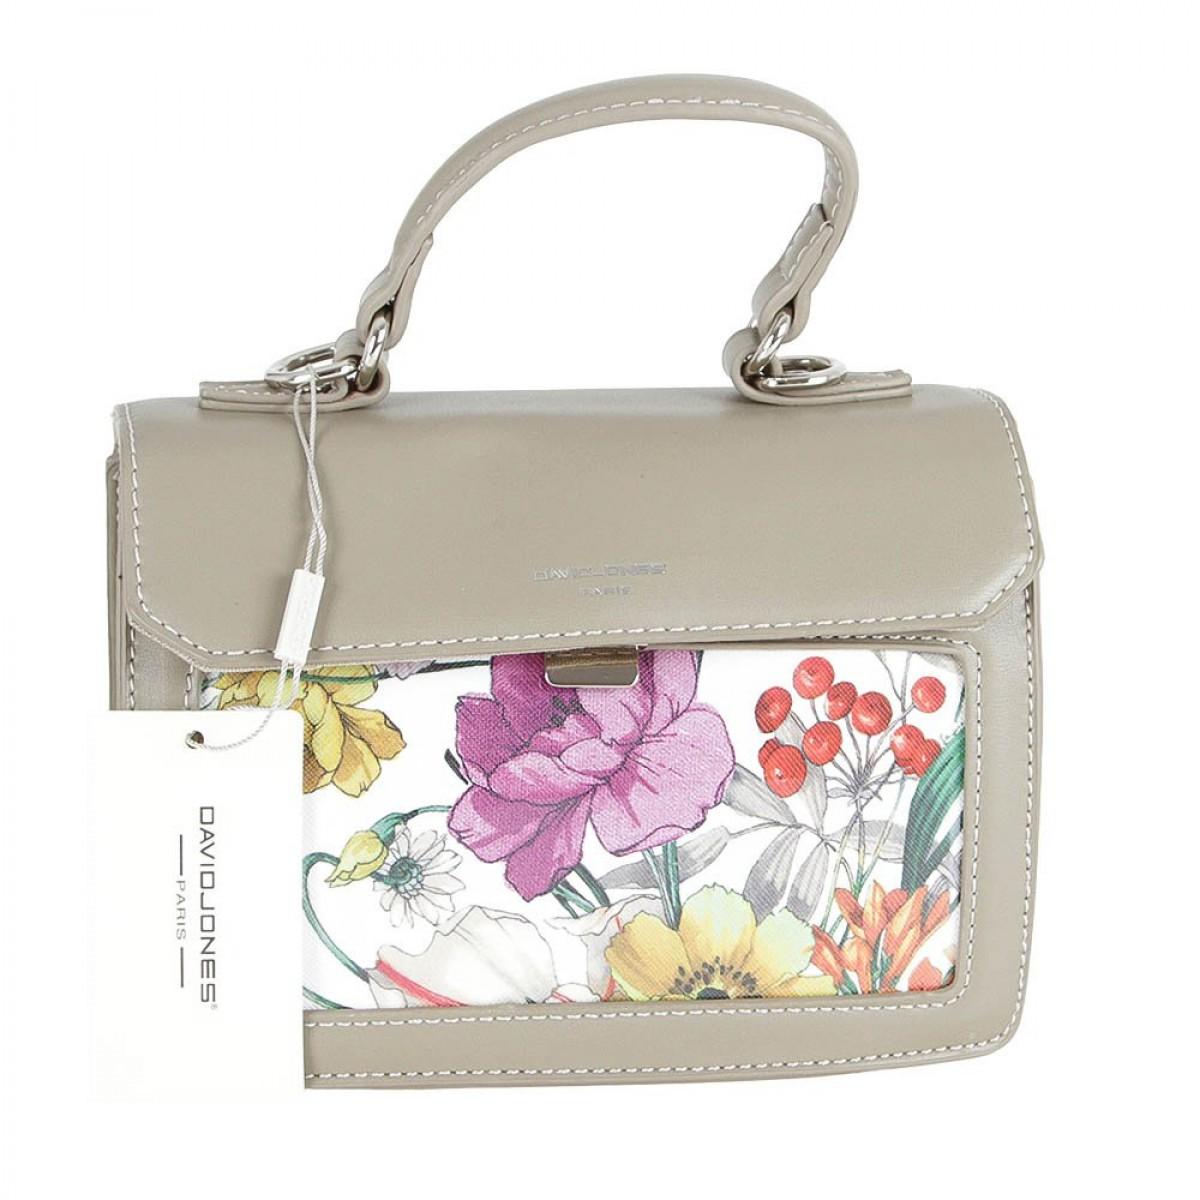 Жіноча сумка David Jones CM5110 TAUPE